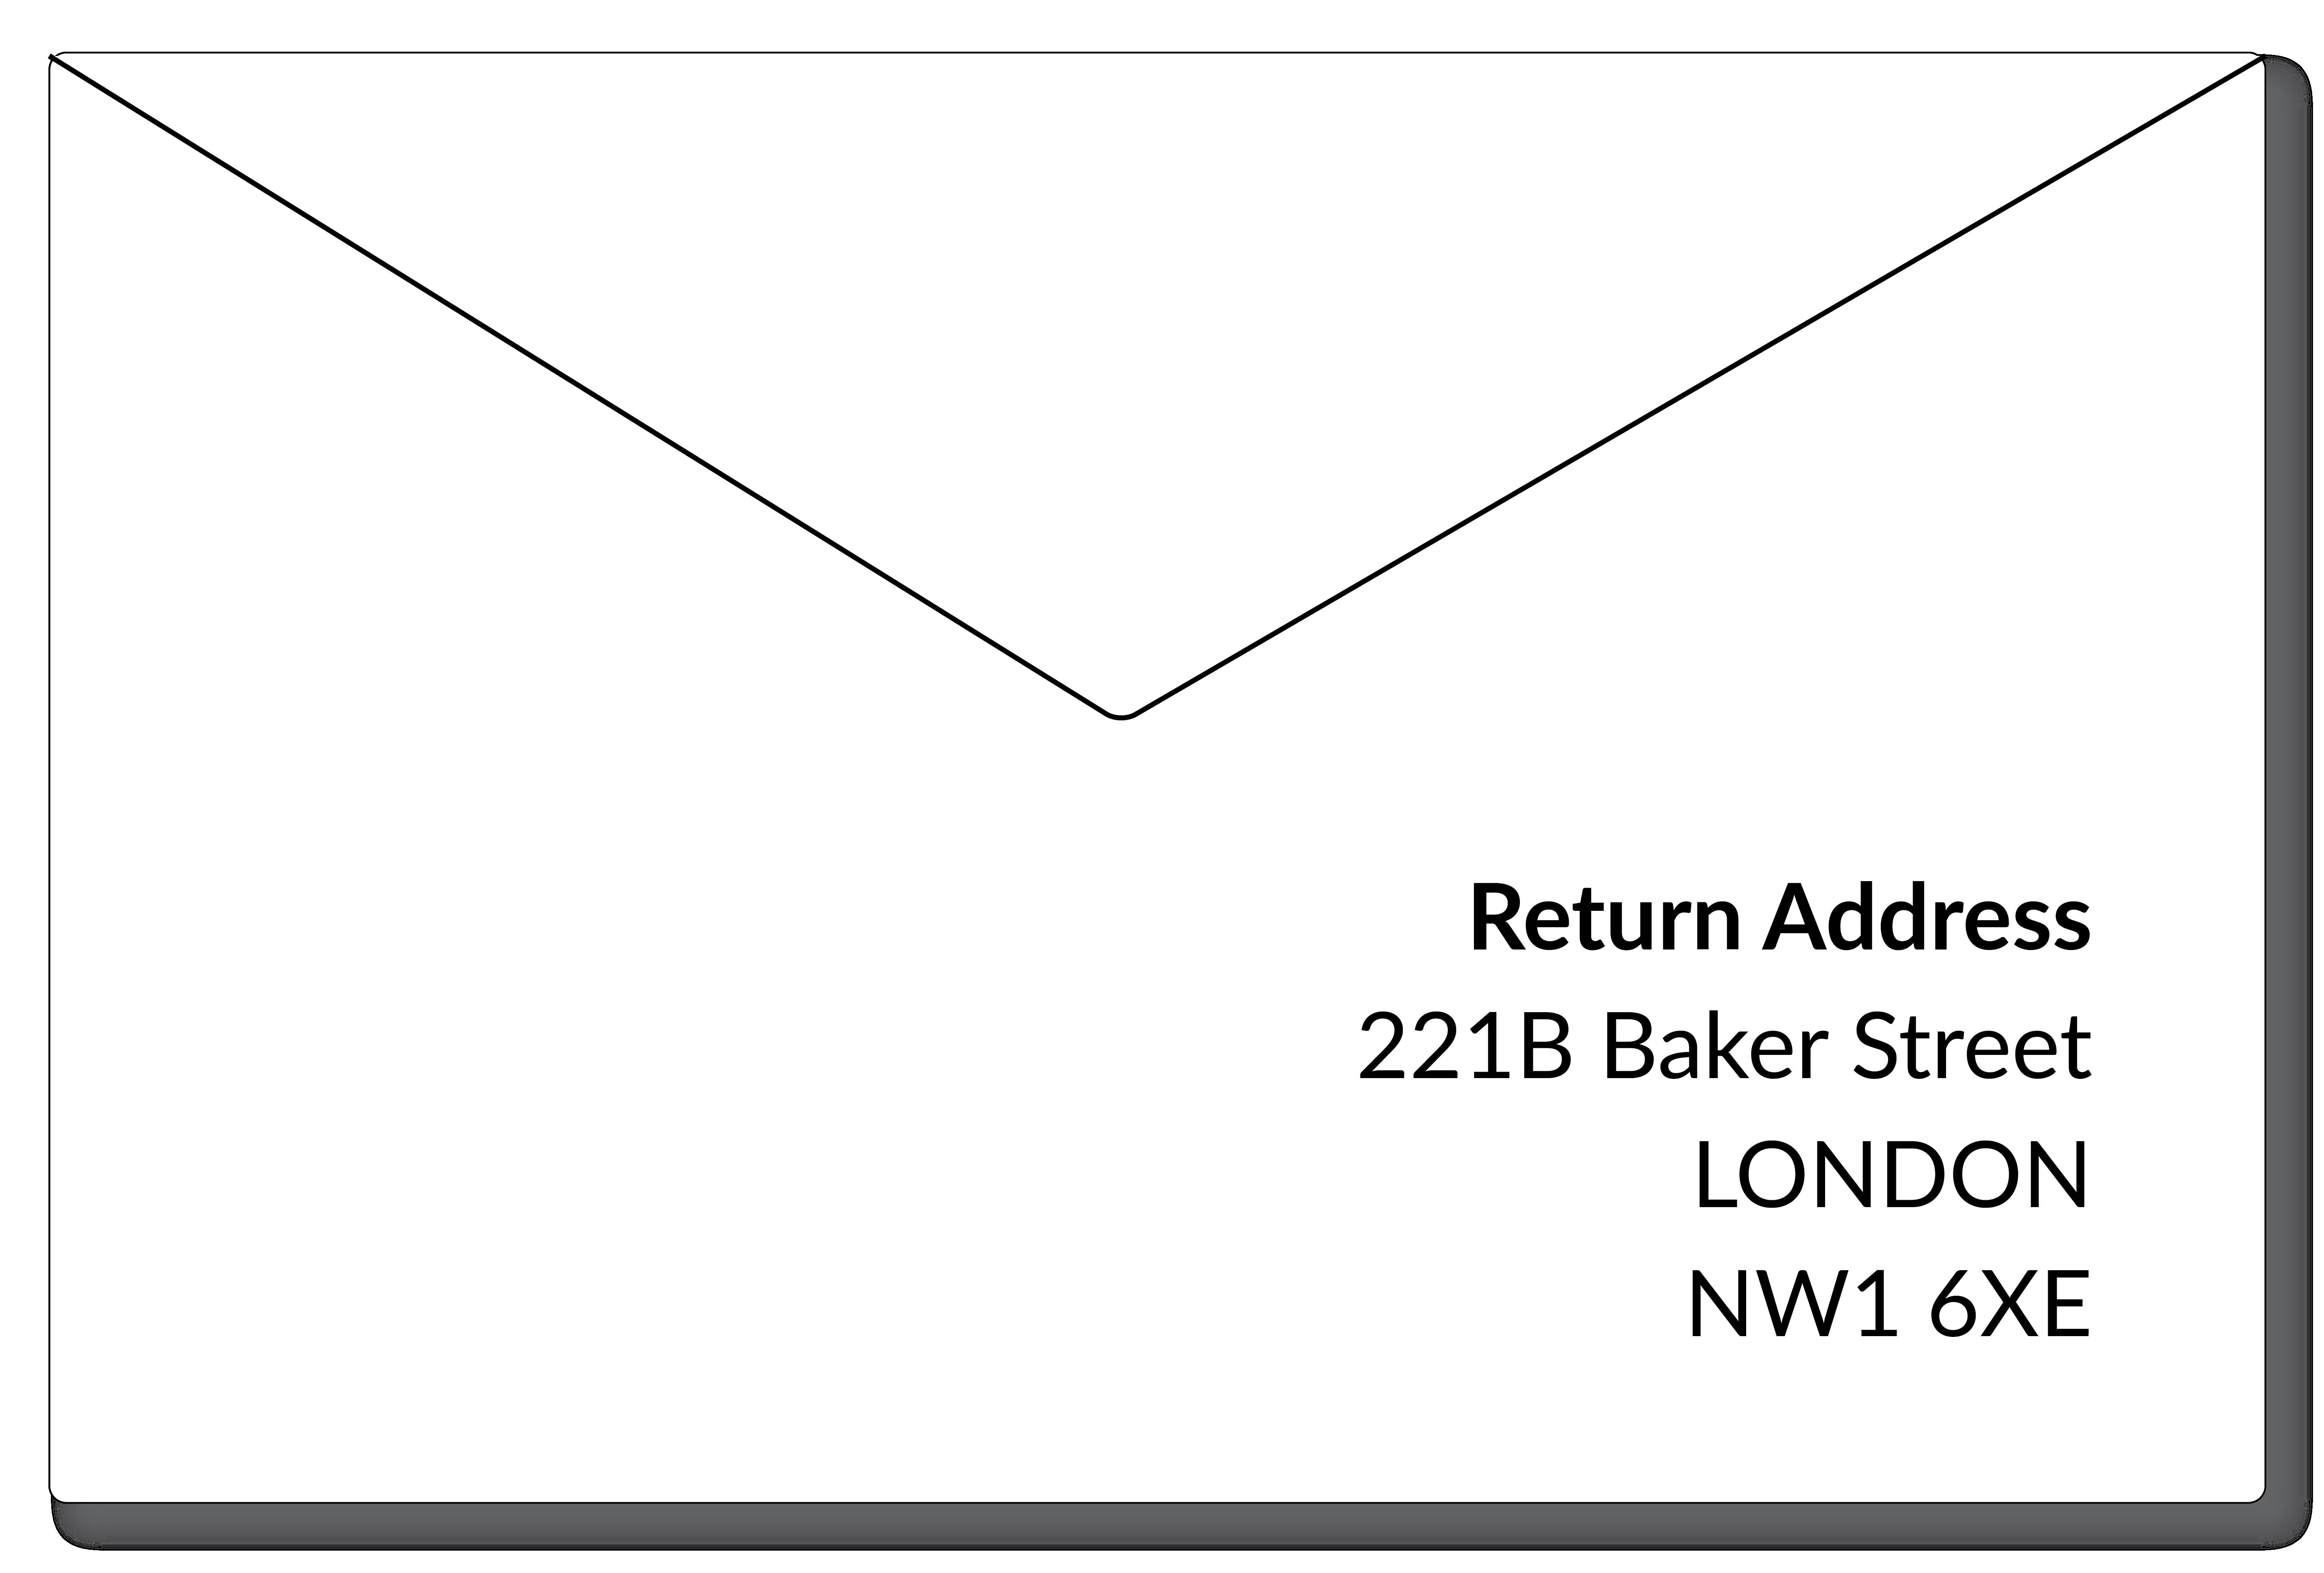 UK Return Address Format